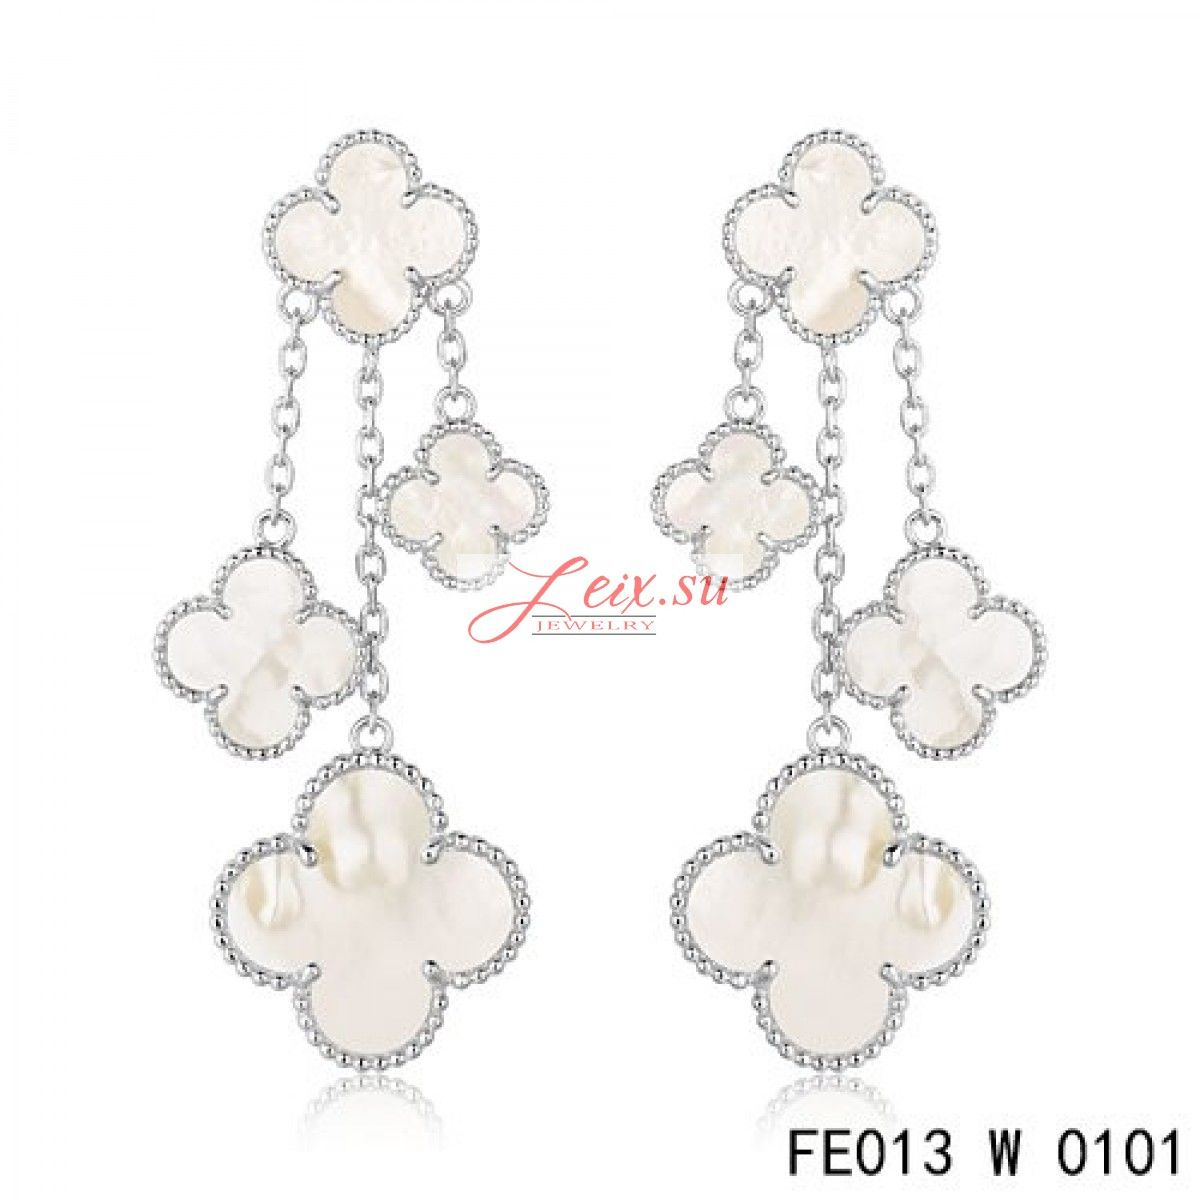 Van Cleef Arpels Replica White Gold Magic Alhambra Earrings Mother Of Pearl 4 Motifs